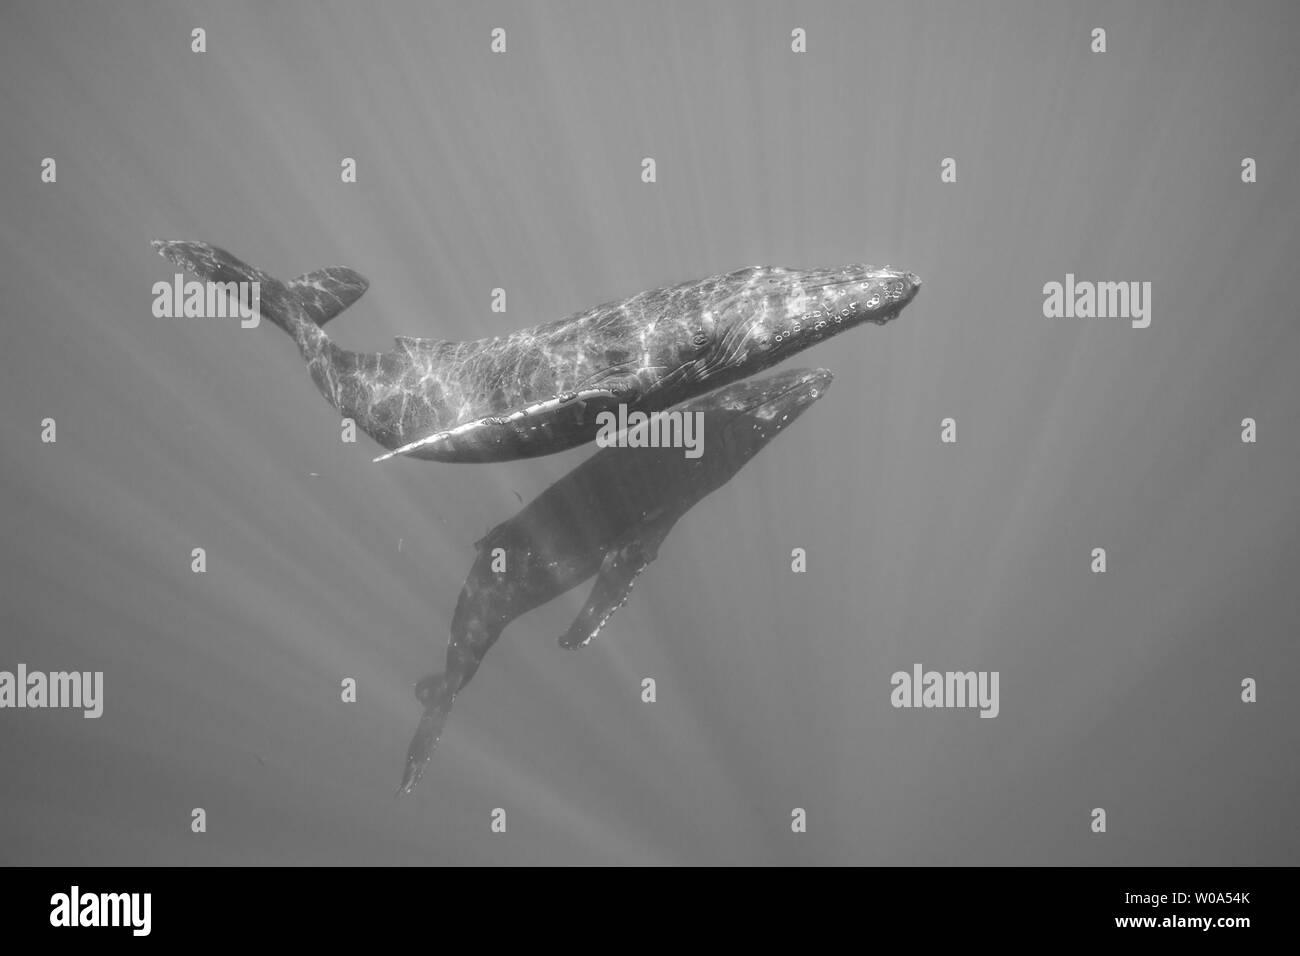 Humpback whales, Megaptera novaeangliae, underwater, Hawaii. Stock Photo